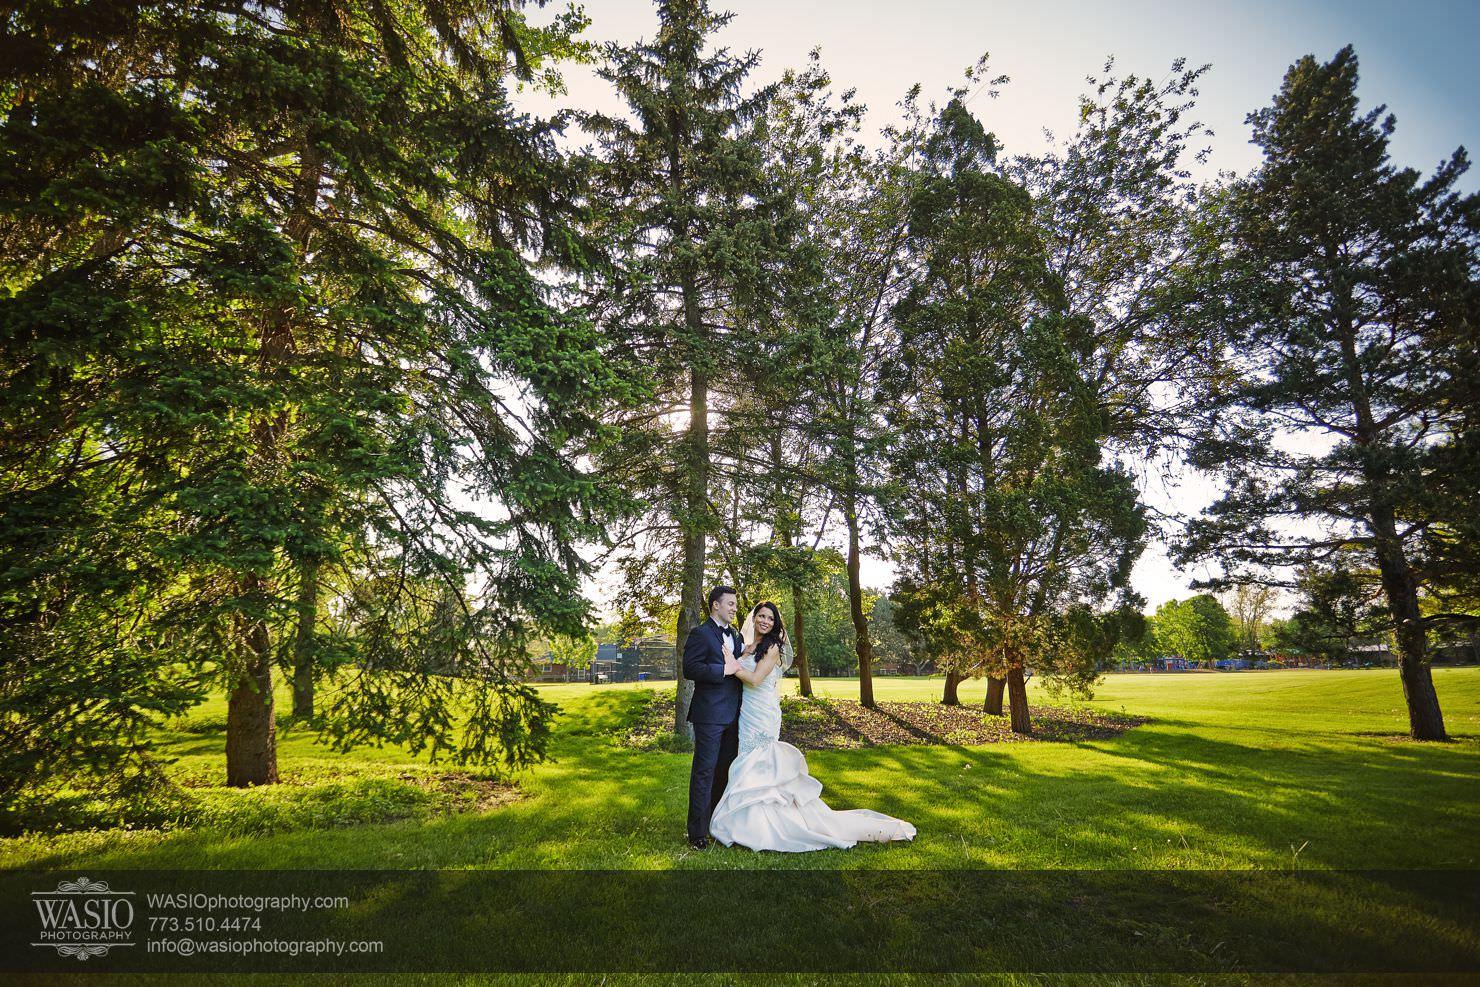 038_Chicago-Spring-Wedding_Chrissy-Andrew_3P4C6065 Chicago Spring Wedding - Chrissy + Andrew